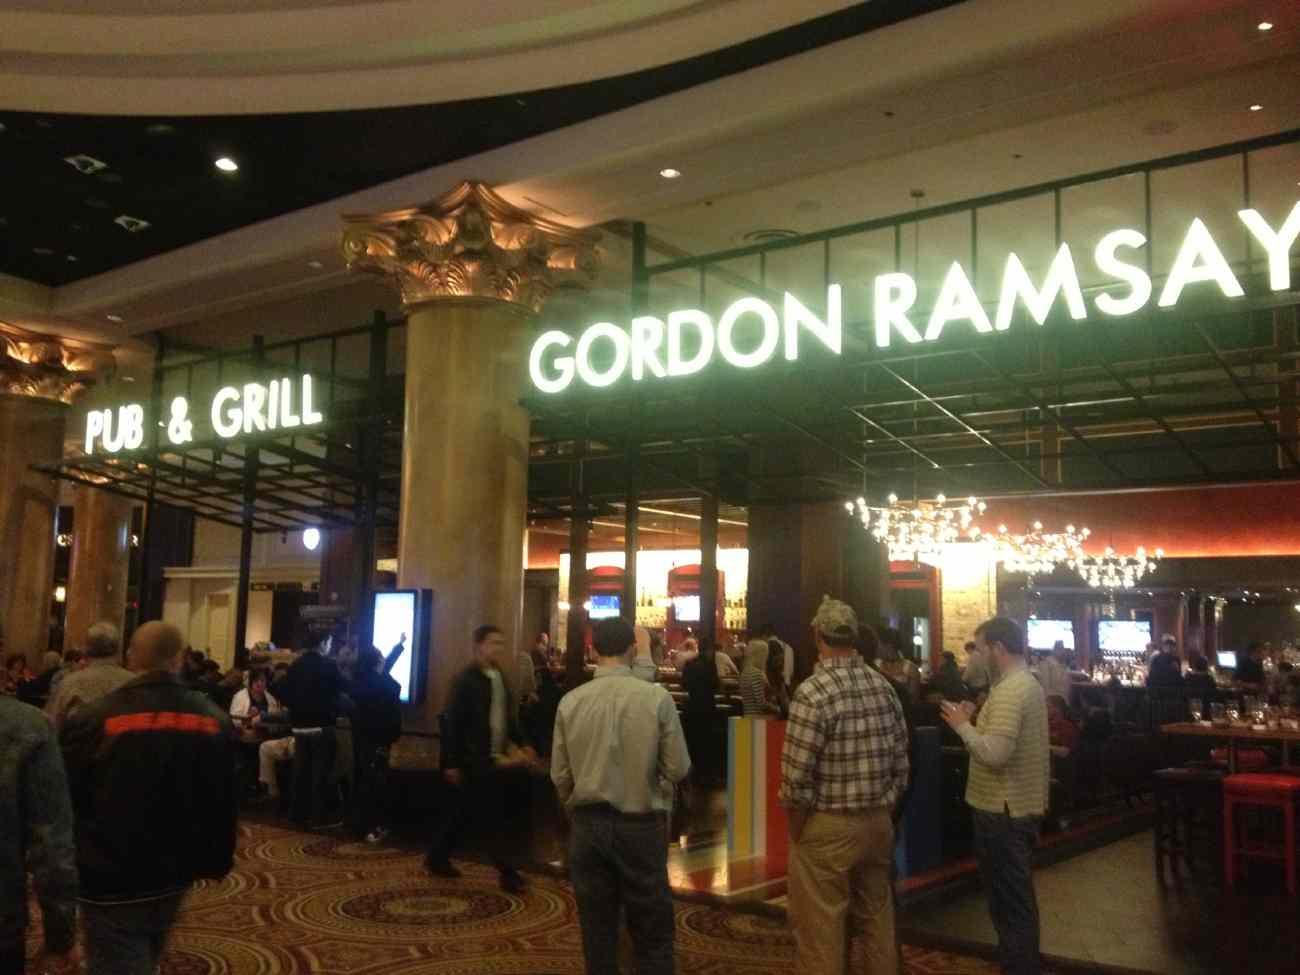 Gordon Ramsay Pub and Grill in Caesars Palace Las Vegas Hotel & Casino.